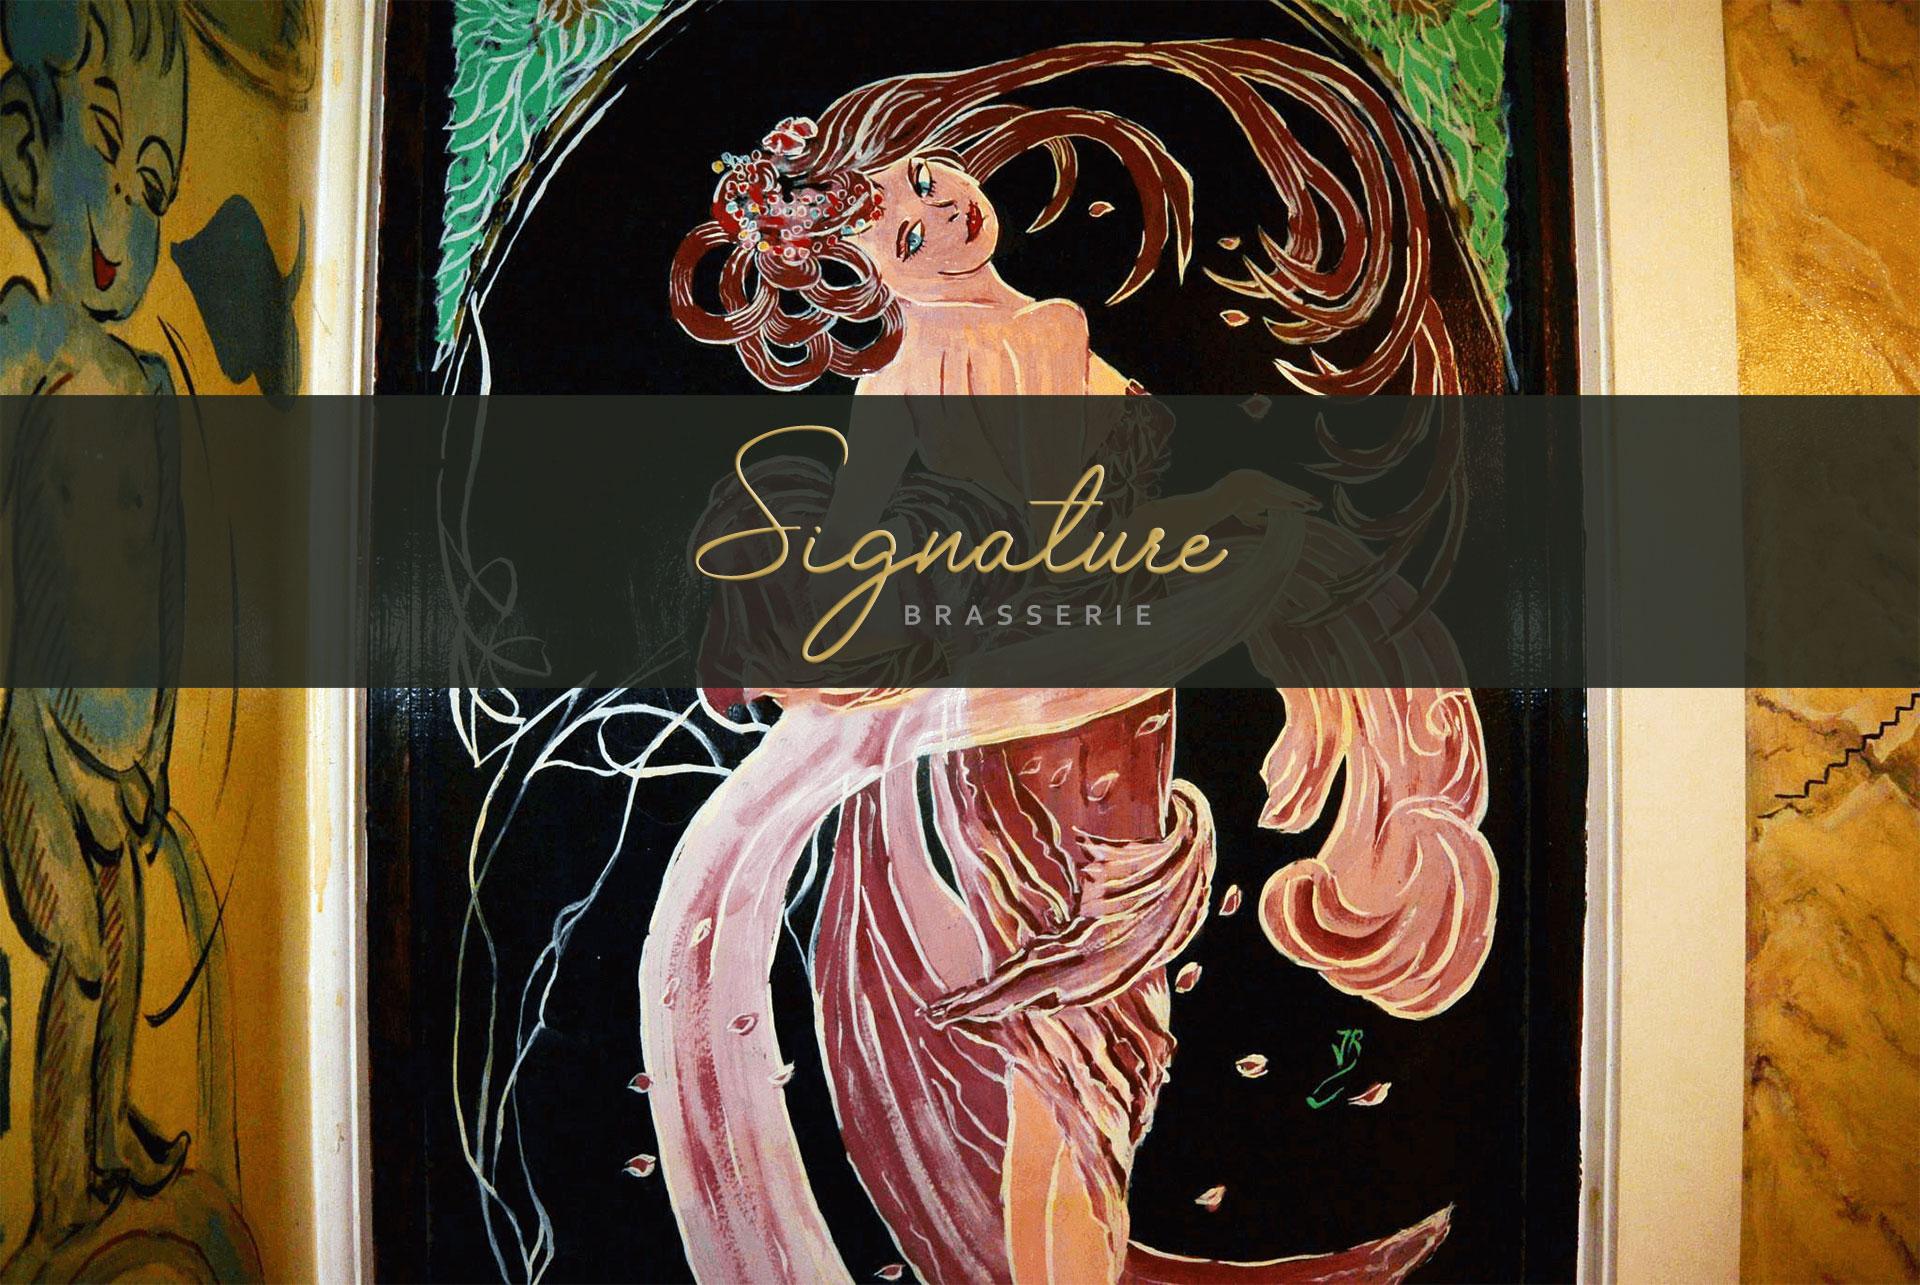 Brasserie Signature home page